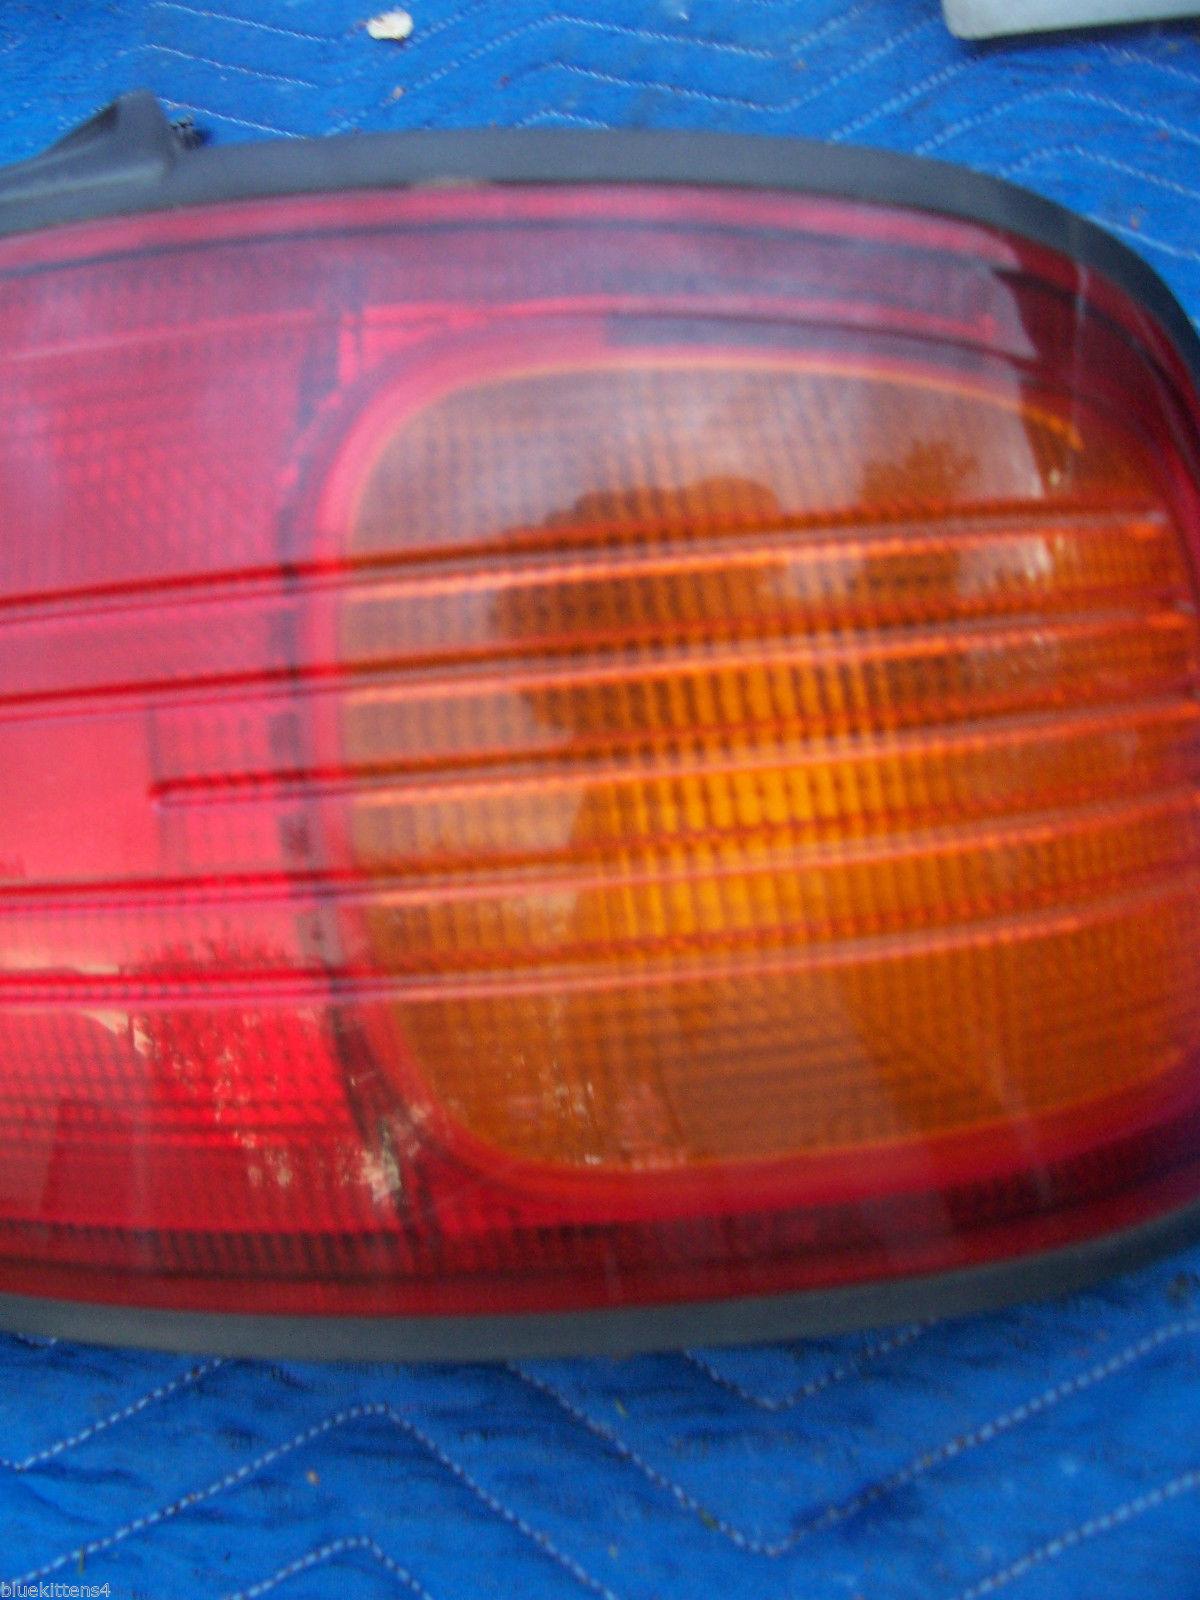 1992 1993 1994 PROTEGE RIGHT TAILLIGHT BRAKE TURN LIGHT OEM USED ORIGINAL MAZDA image 4